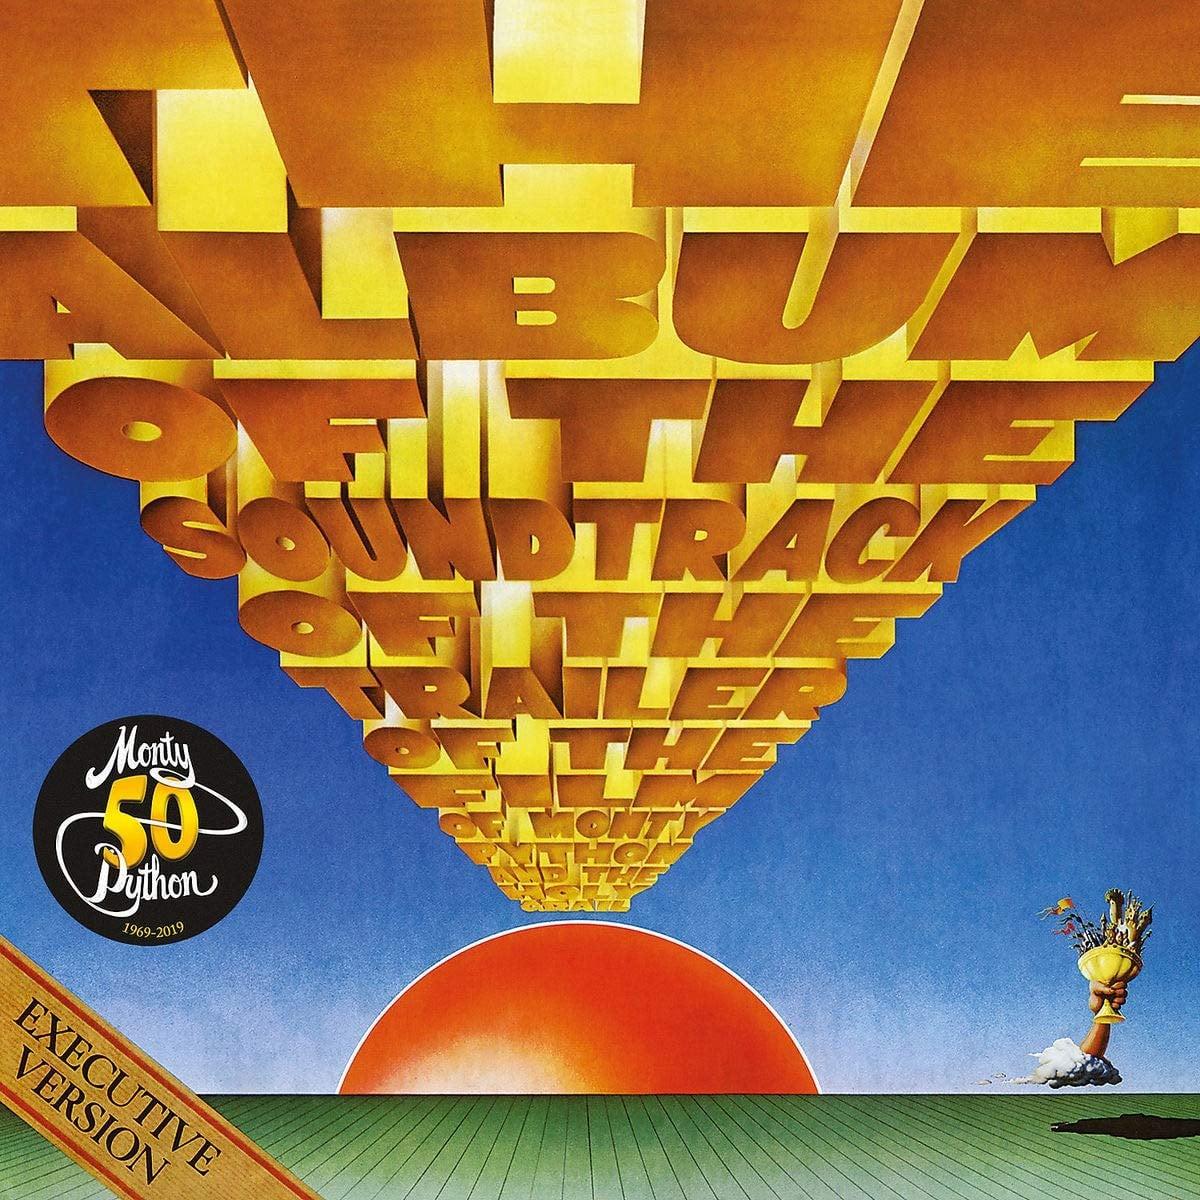 MONTY PYTHON - THE ALBUM OF THE SOUNDTRACK